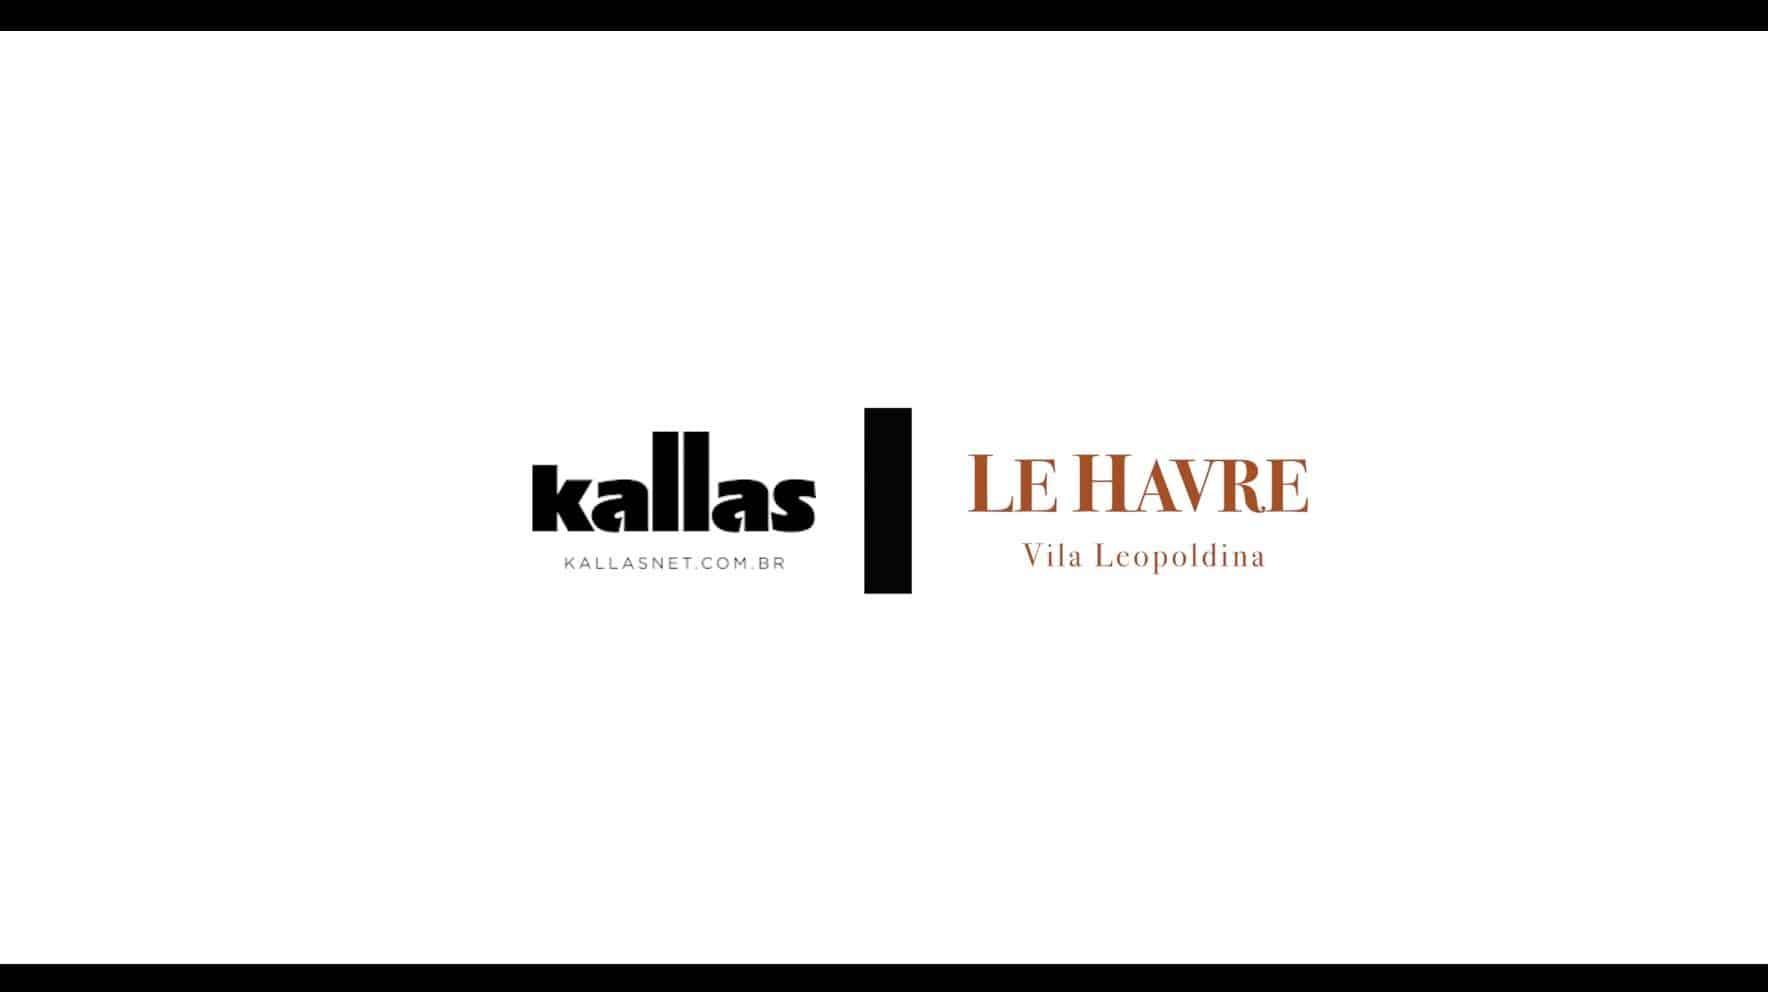 KALLAS LE HAVRE FOTO1 1